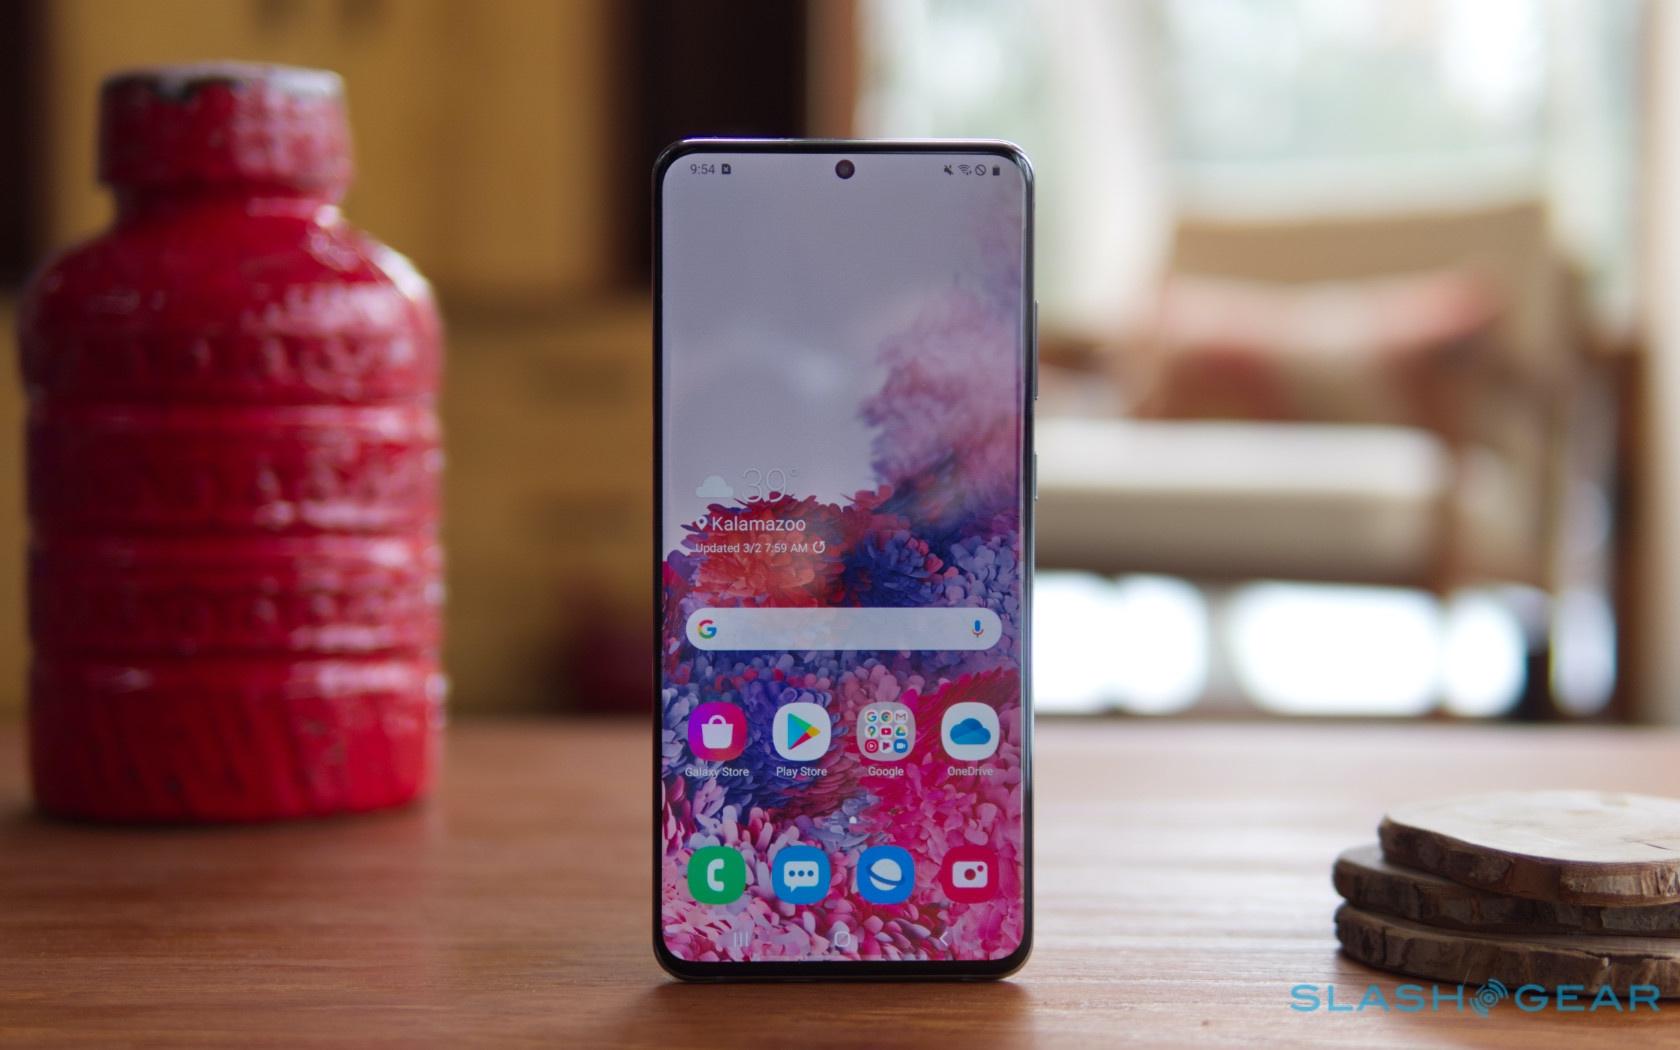 Samsung Galaxy S20 Ultra Review Too Much Slashgear